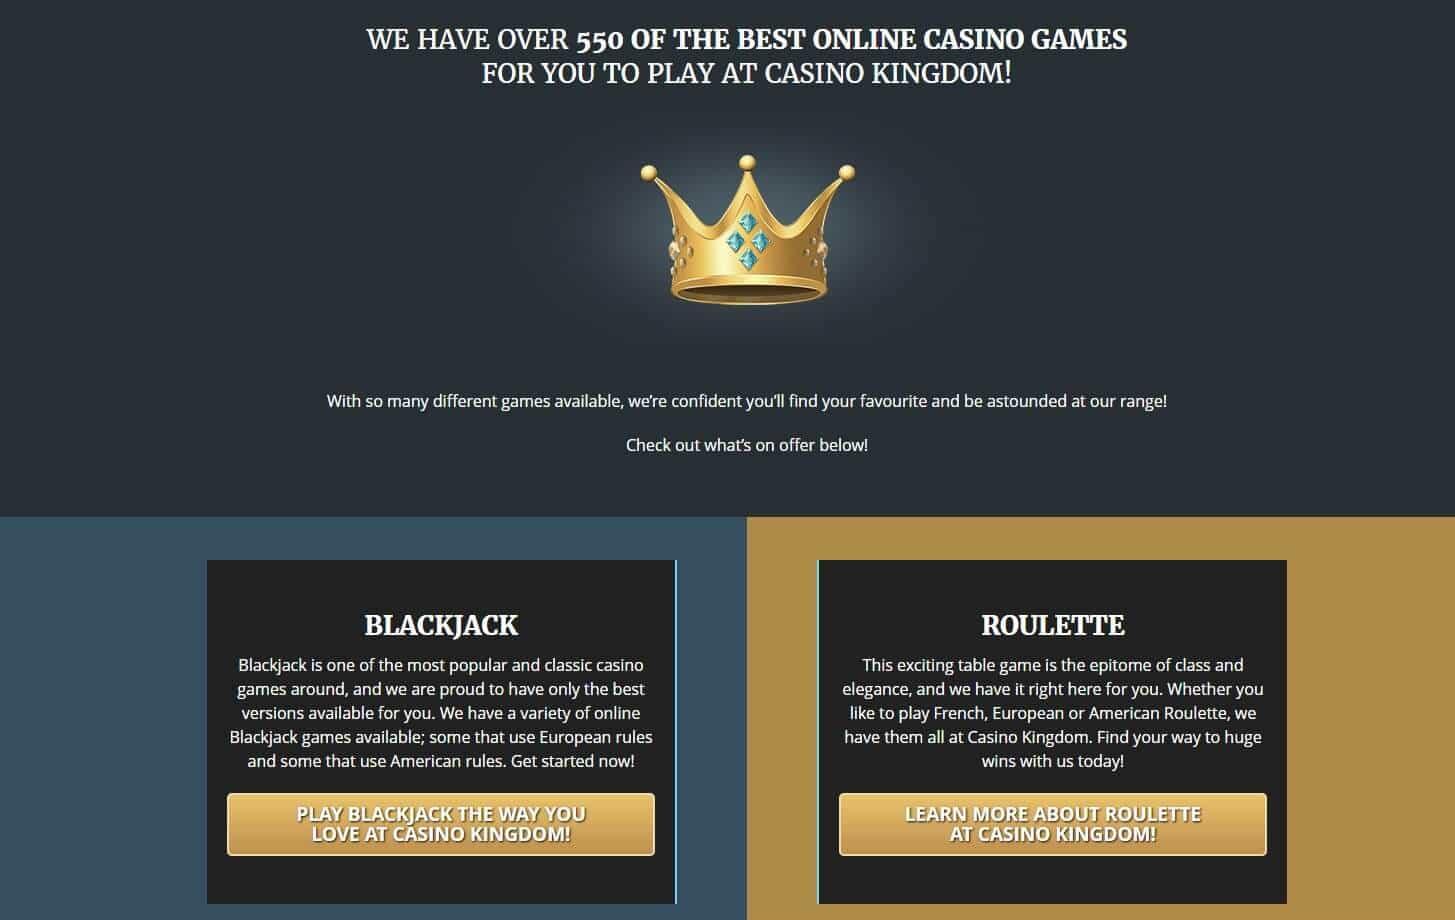 Casino kingdom games